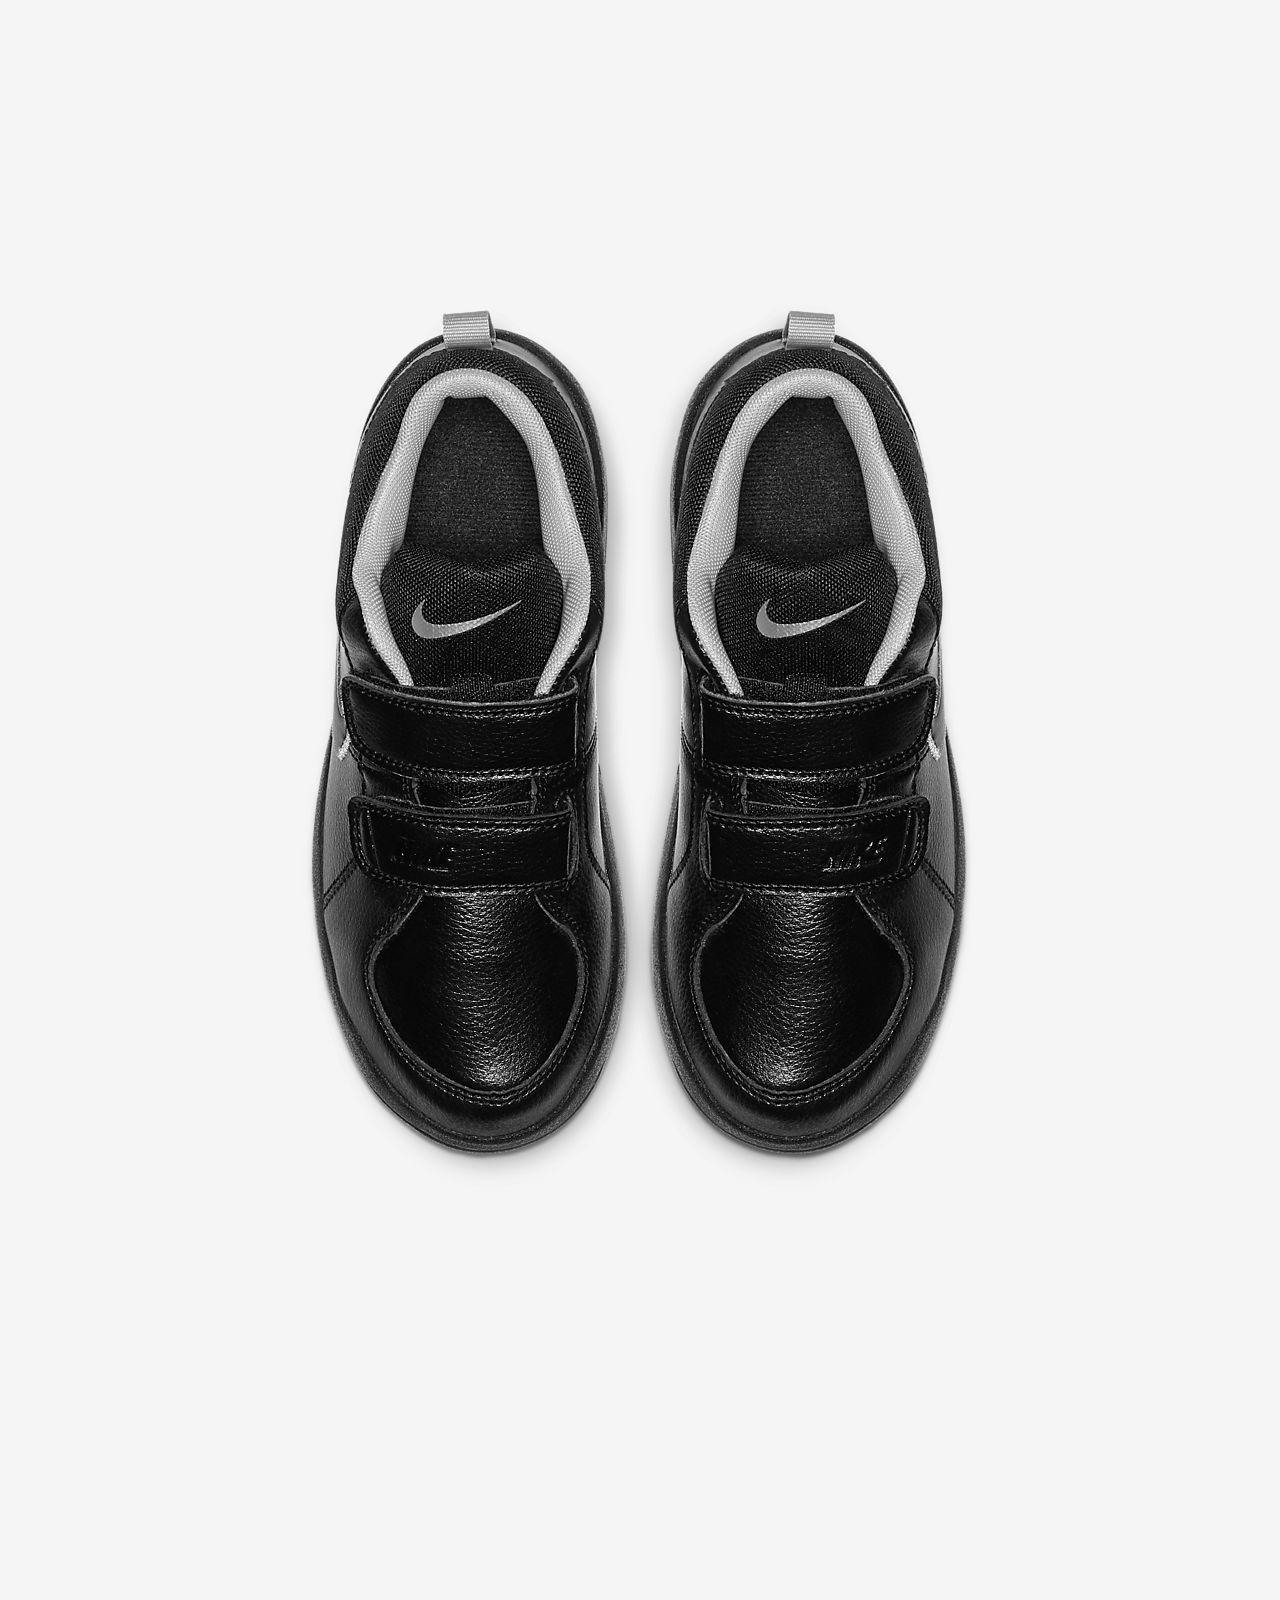 38fbd08171b Calzado para niños talla pequeña Nike Pico 4. Nike.com MX